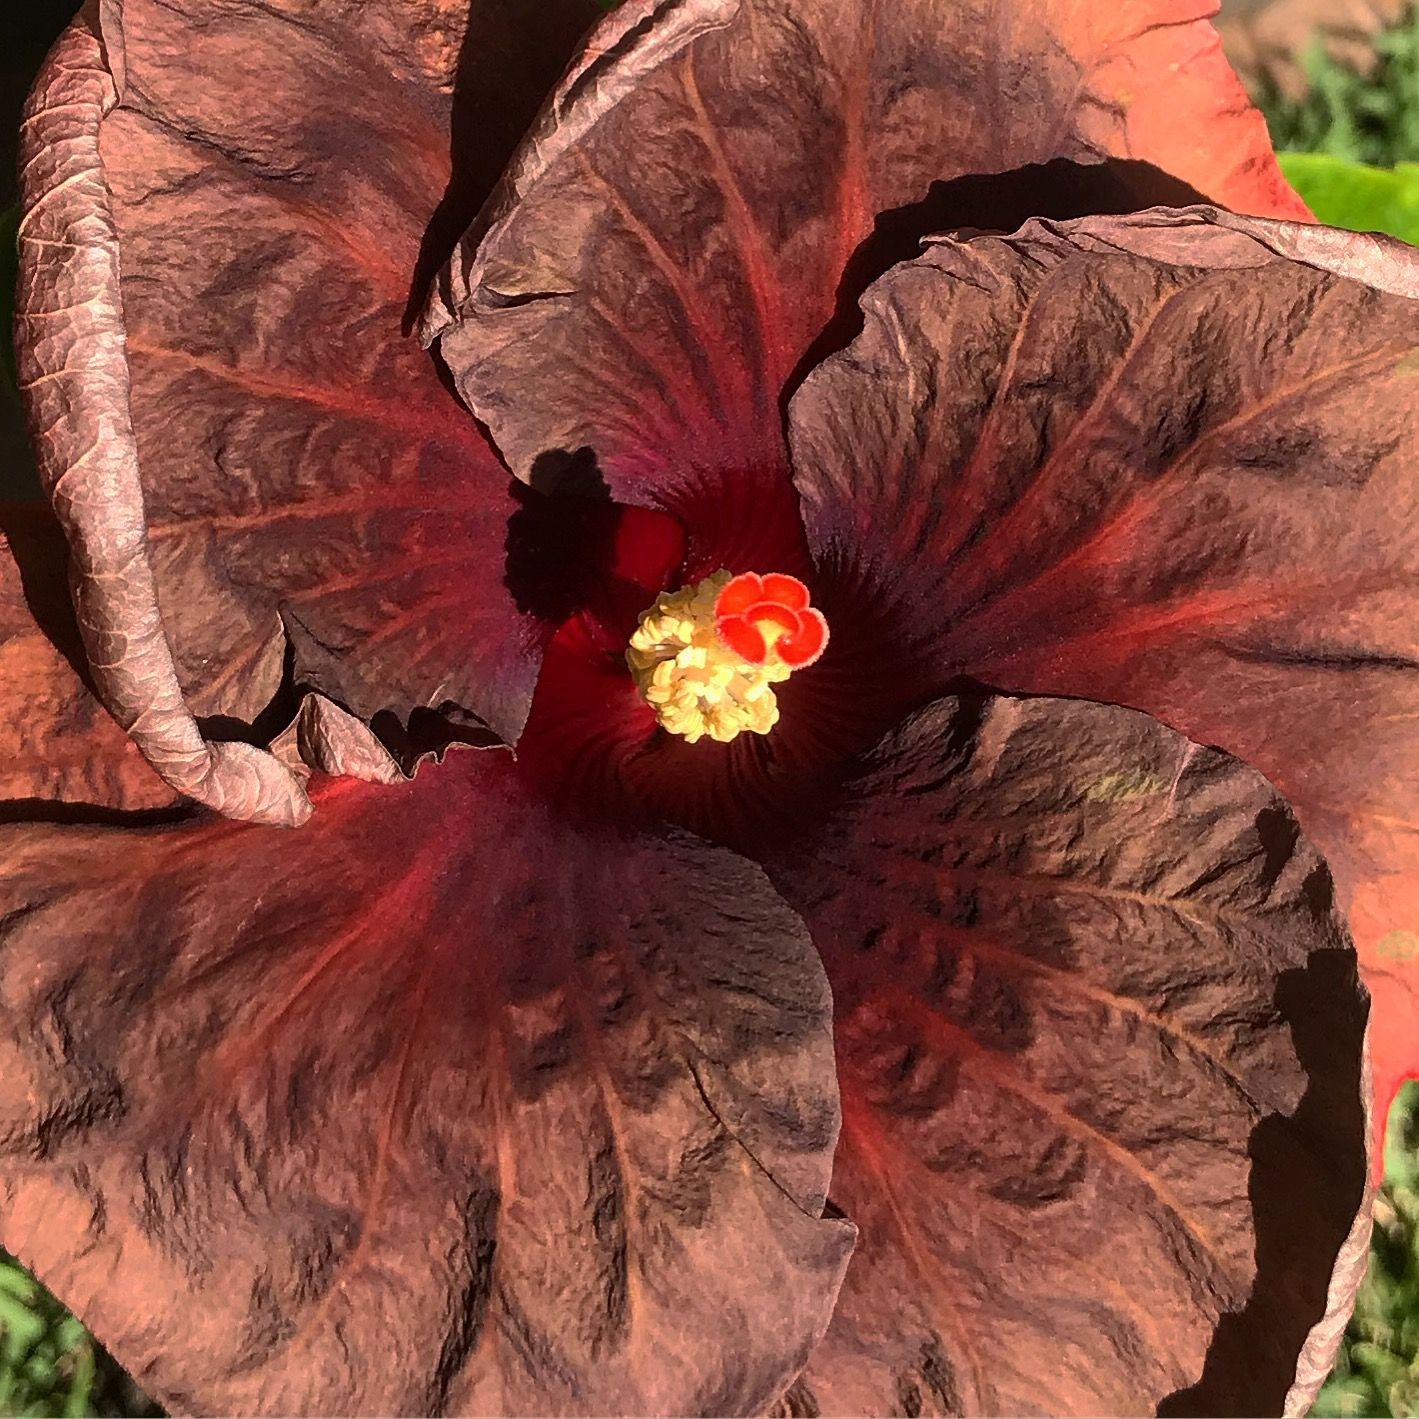 Luks dark inferno hibiscus hibiscus pinterest hibiscus and flowers luks dark inferno hibiscus izmirmasajfo Gallery